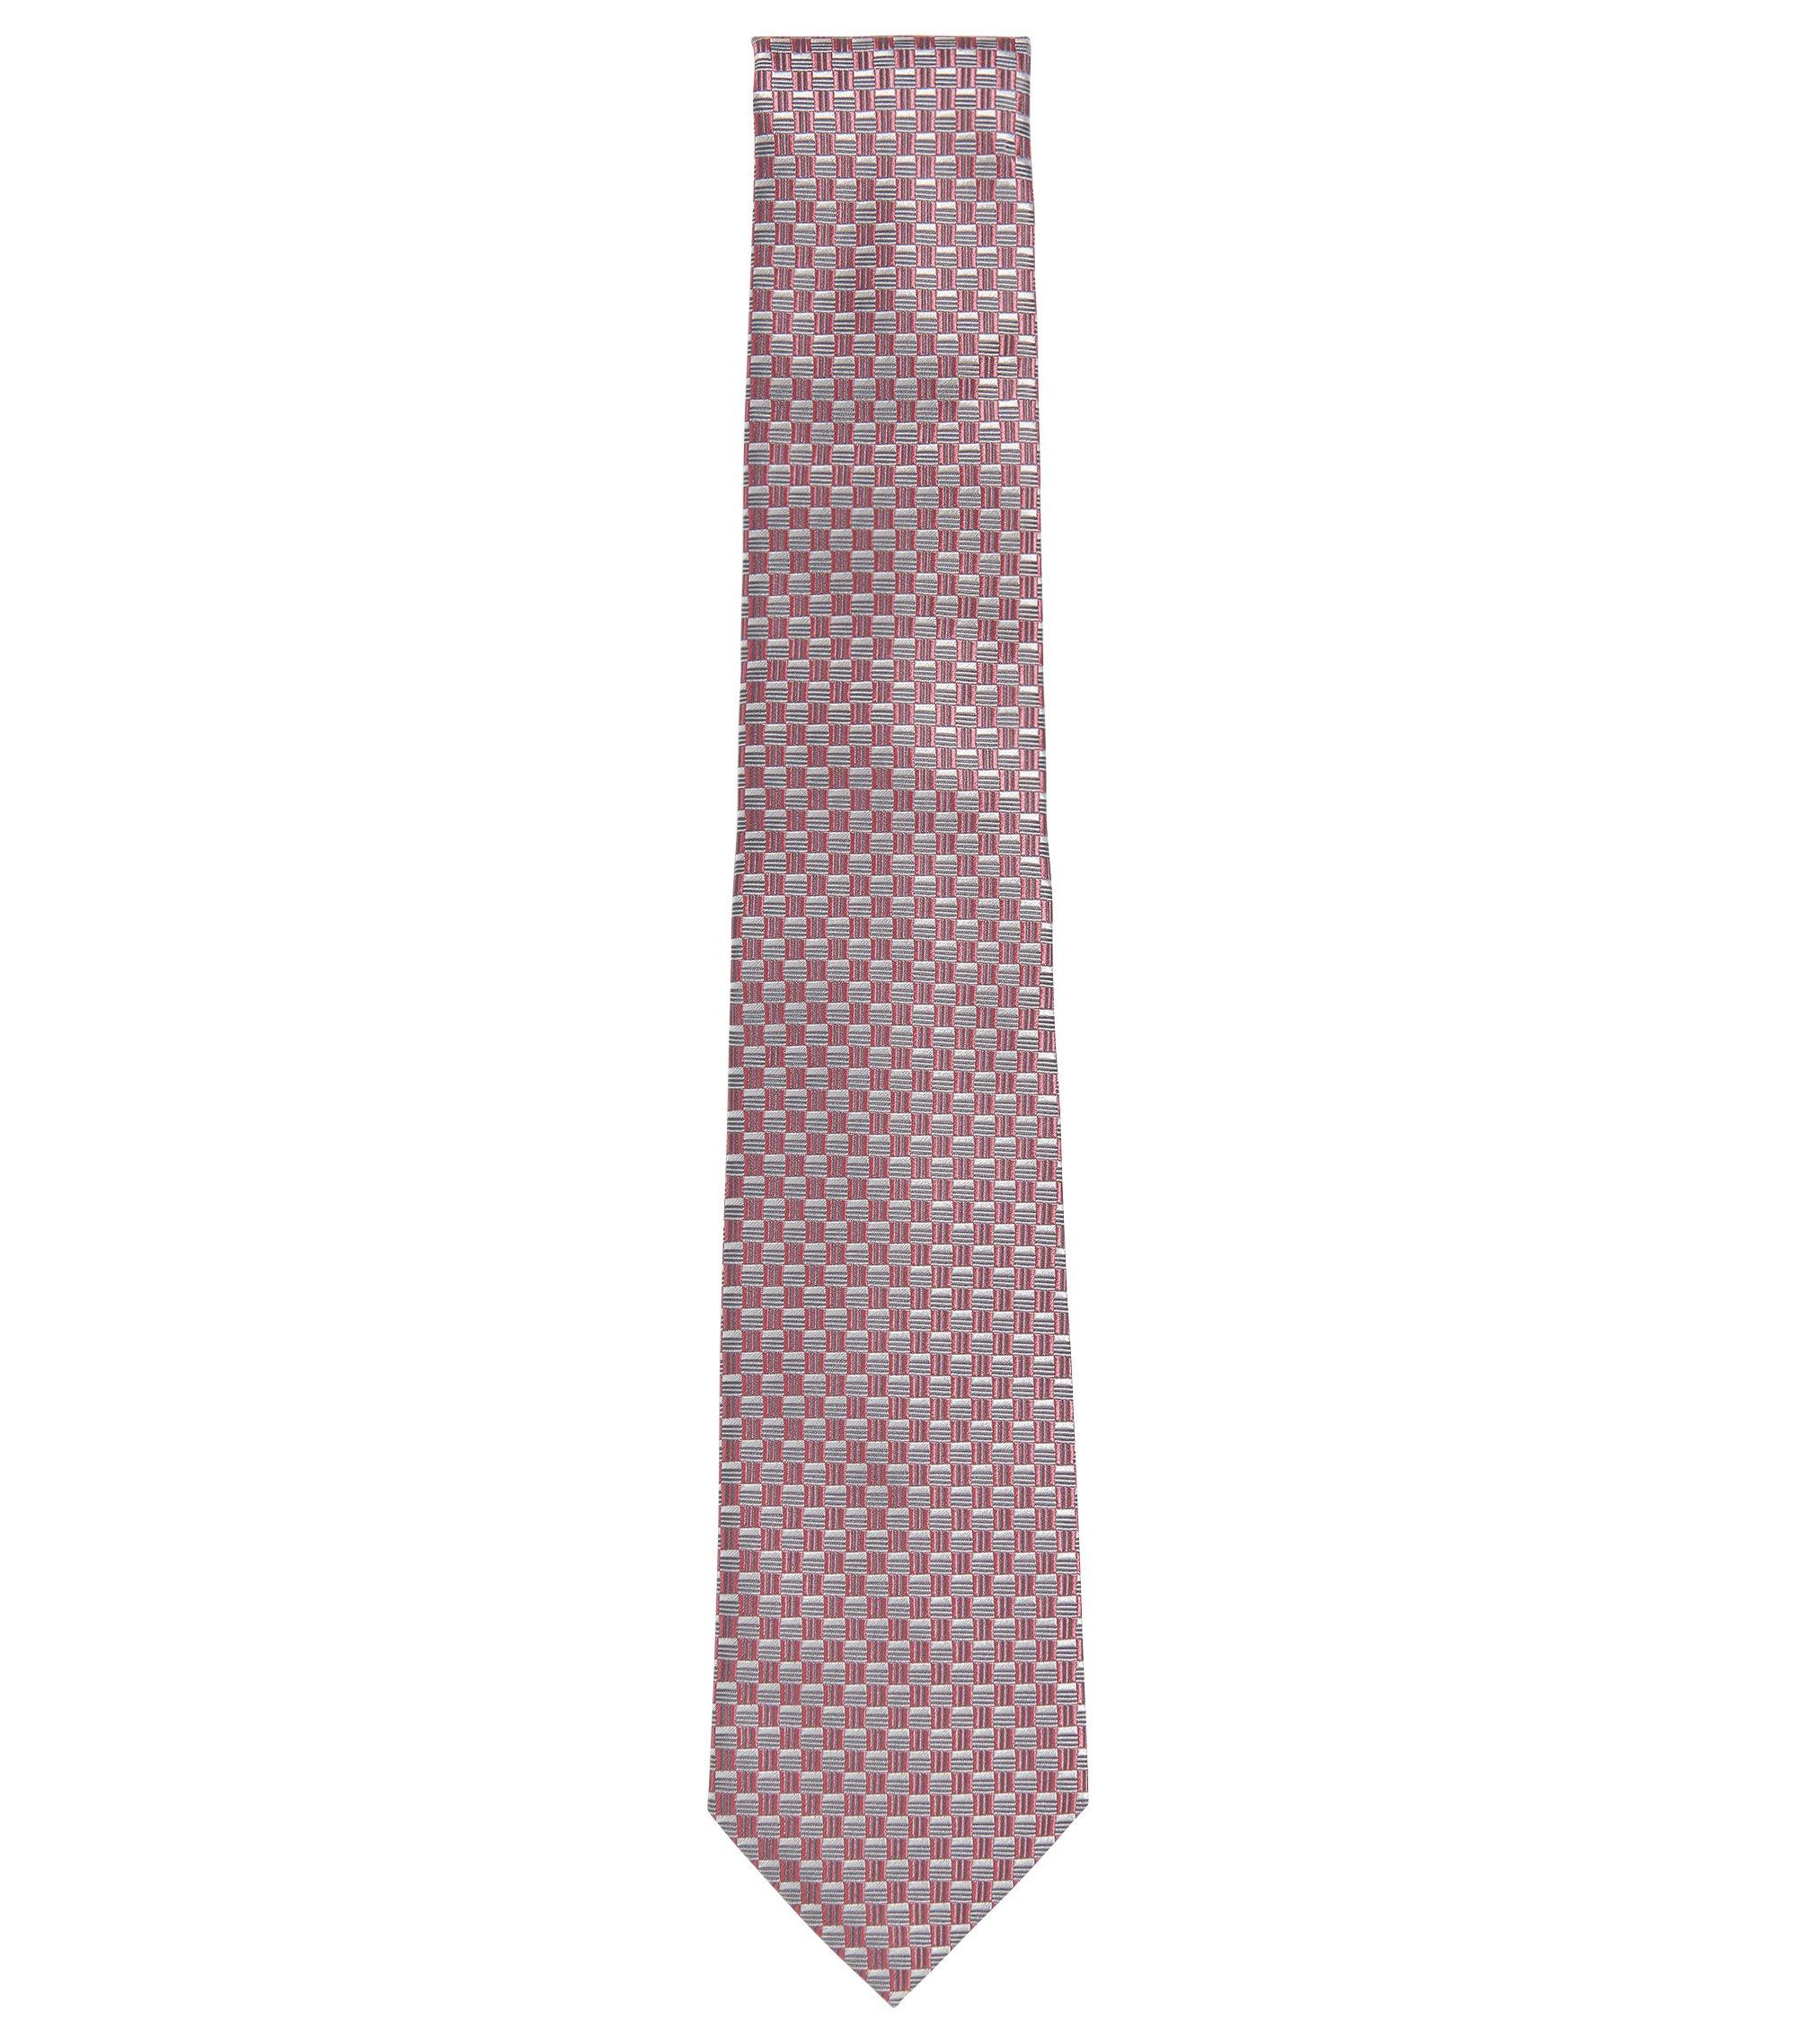 BOSS Tailored Birdseye Italian Silk Tie, Pink